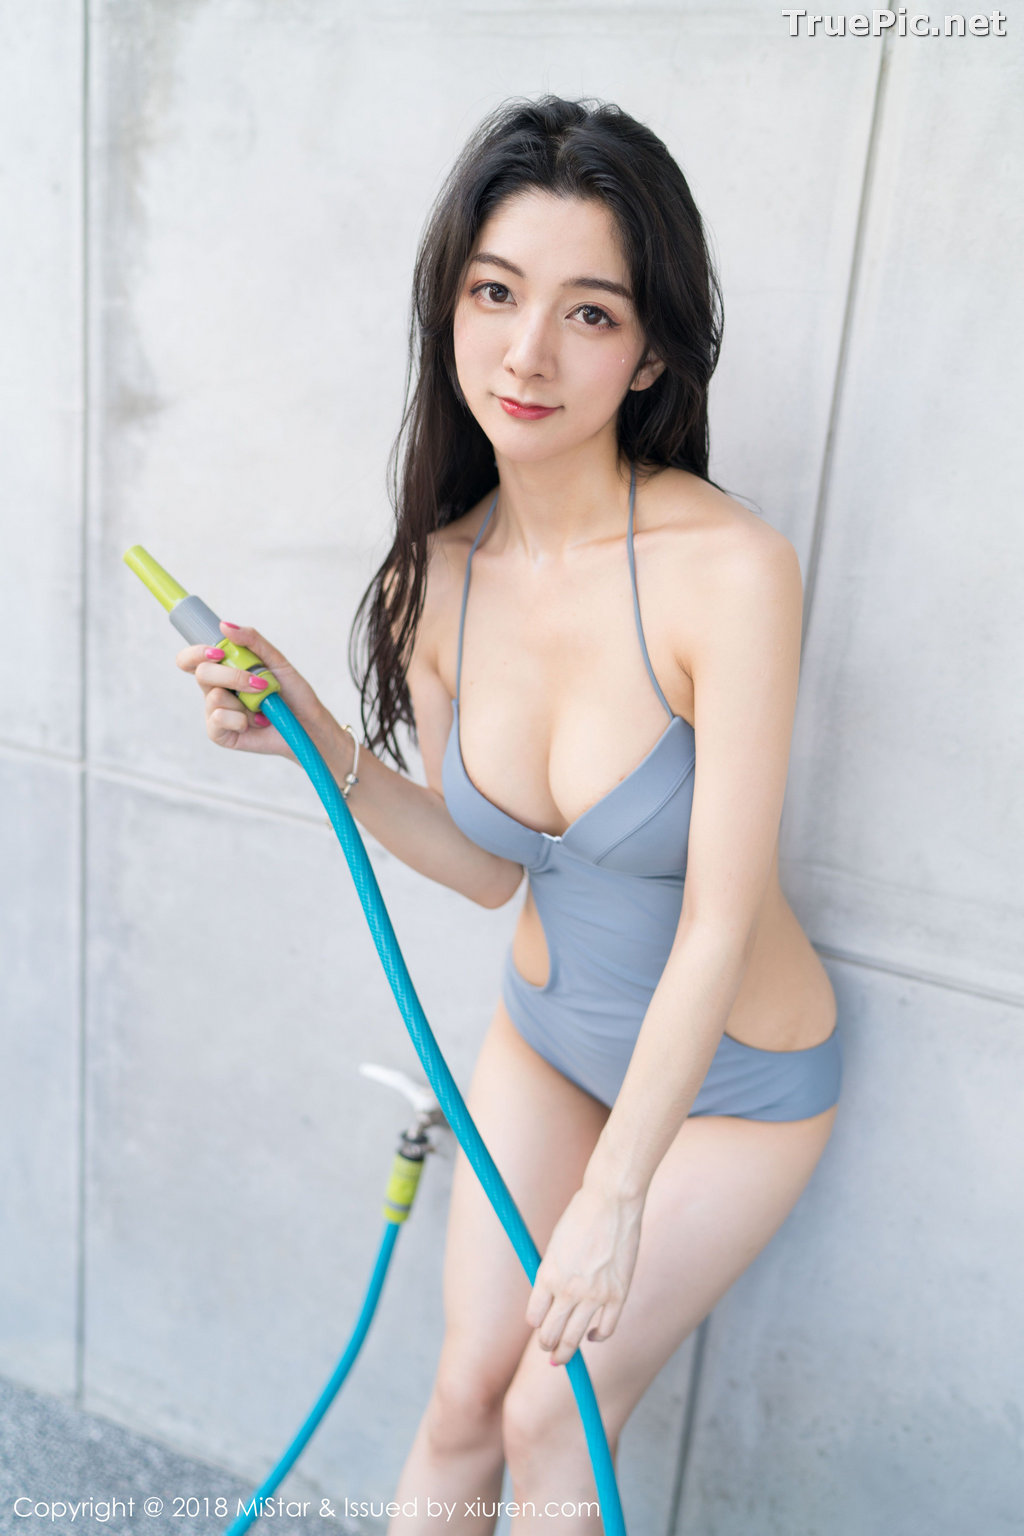 Image MiStar Vol.238 - Chinese Model - Xiao Reba (Angela小热巴) - Sleep Dress and Monokini - TruePic.net - Picture-36